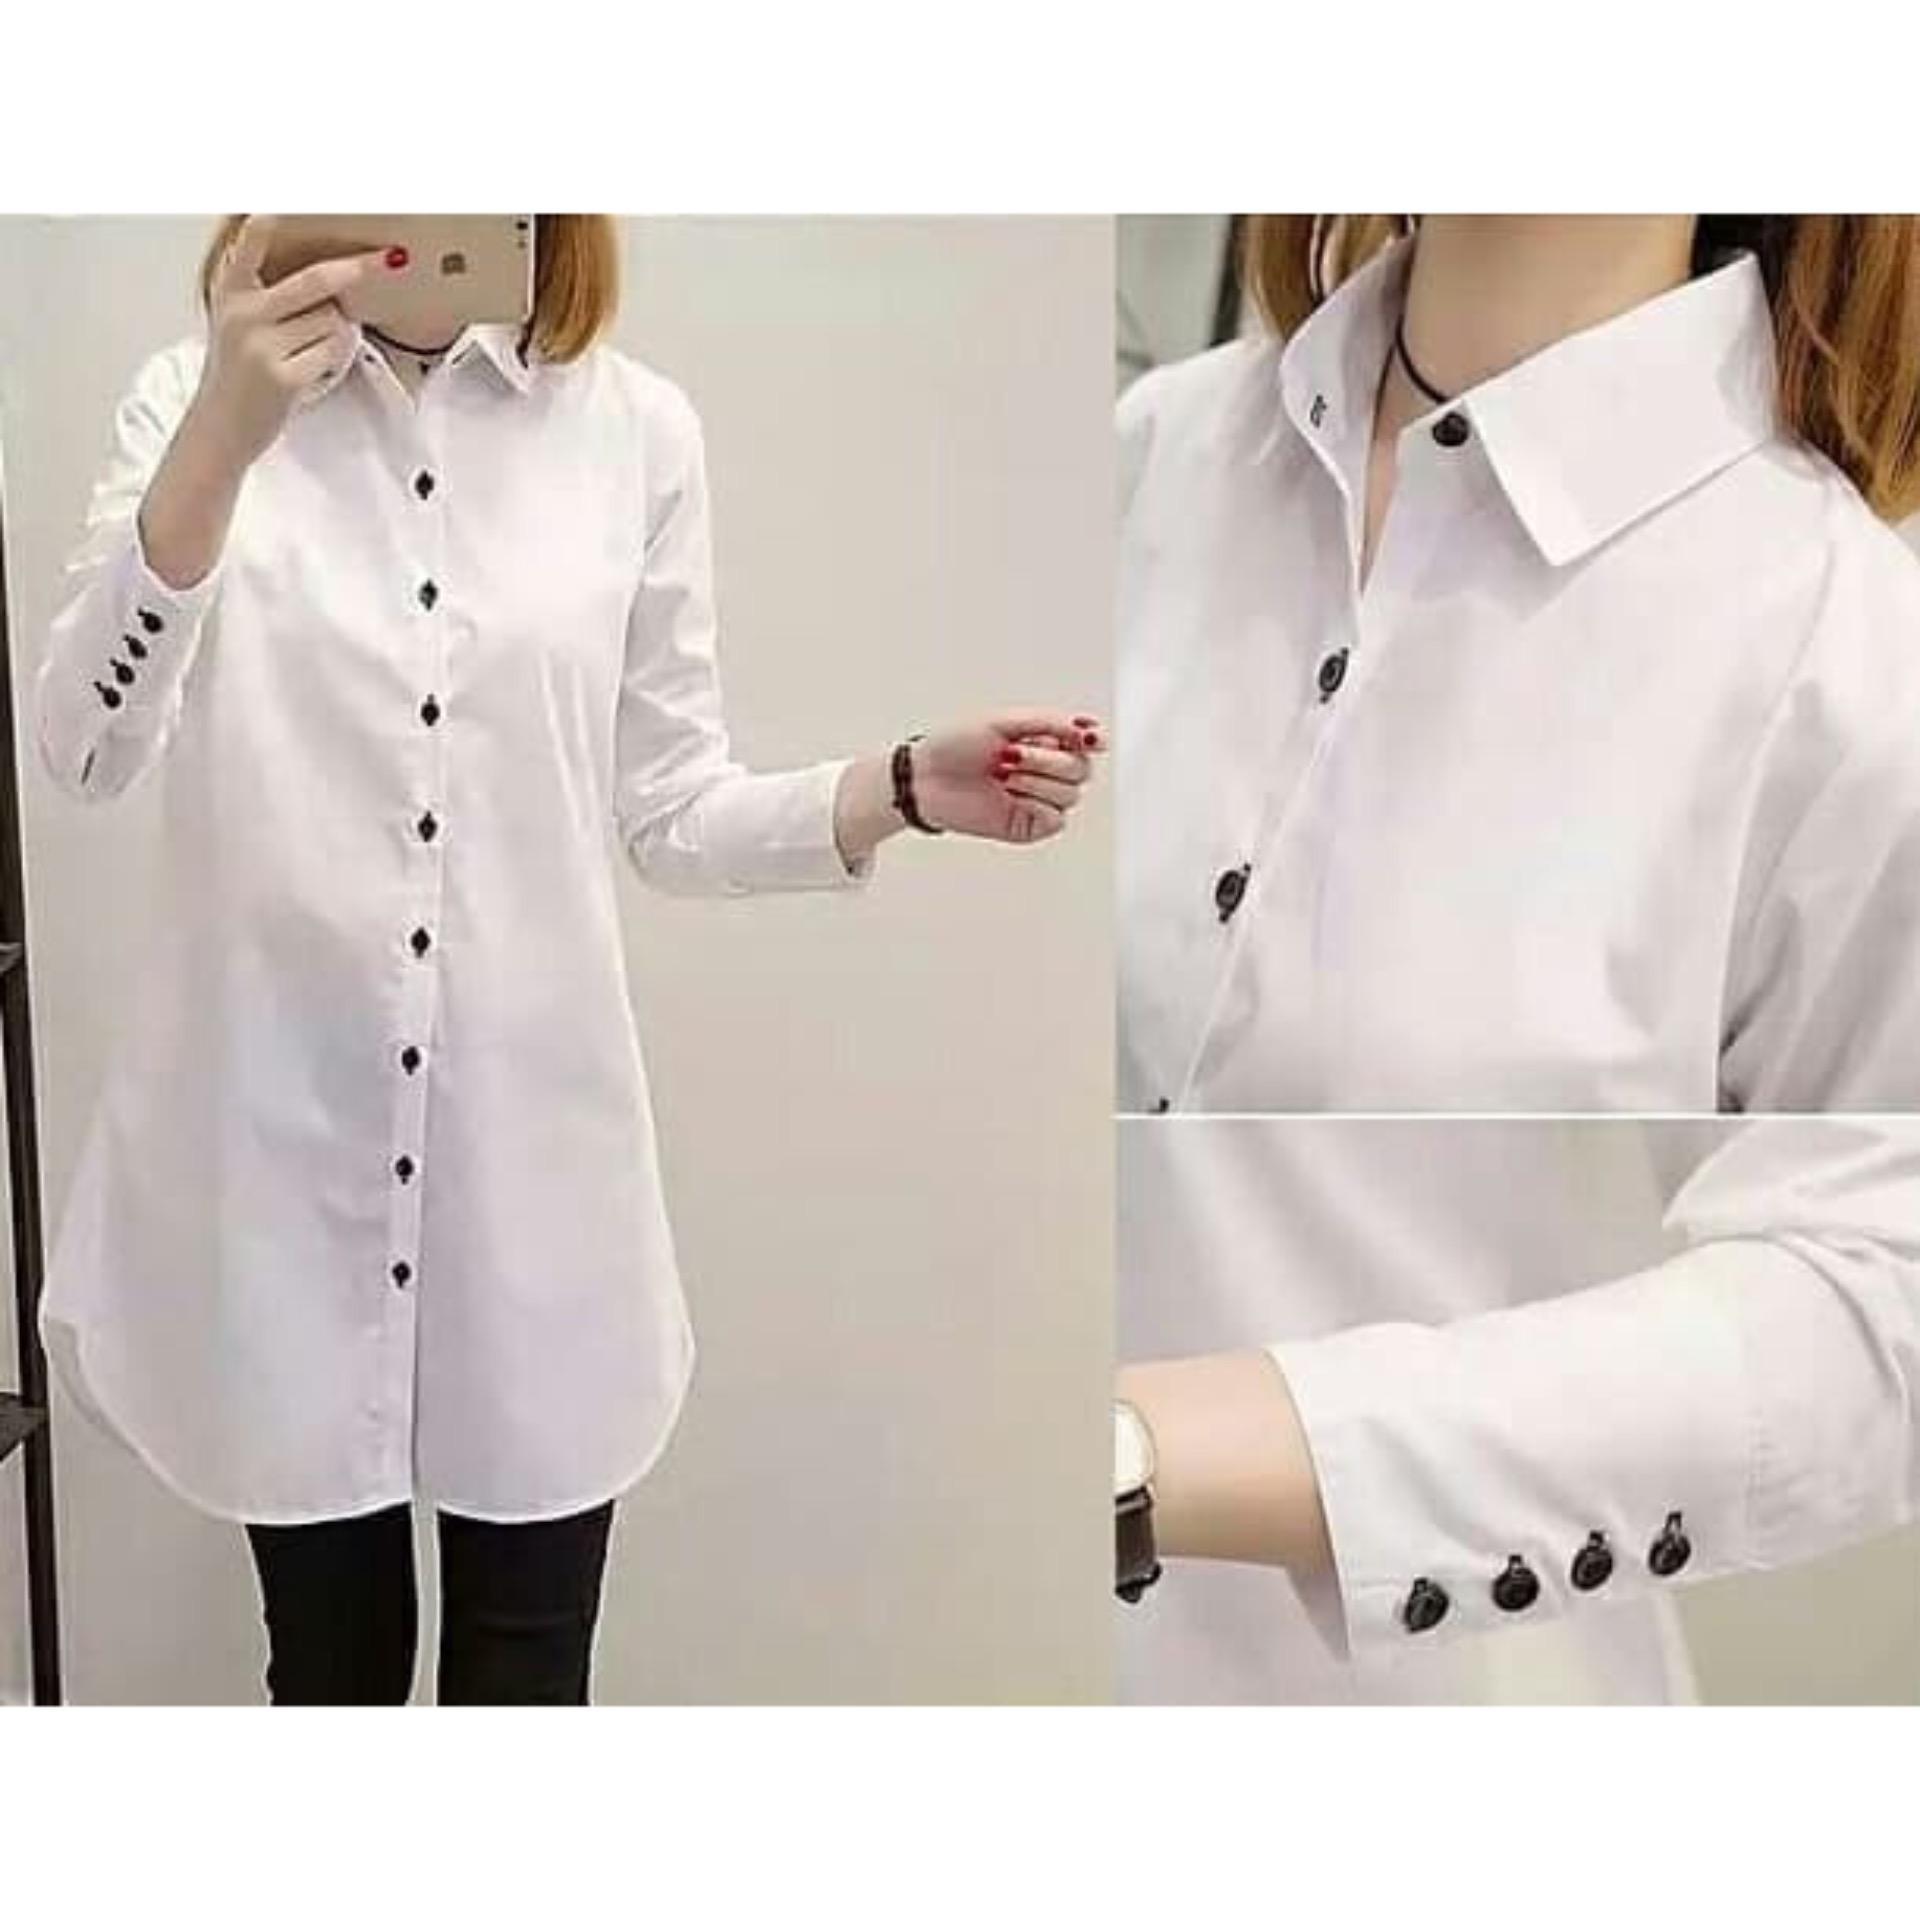 GA Fashion Kemeja Aqua Tunik Putih Baju Wanita / Blouse Korea / Atasan Wanita / Baju Formal / Kemej